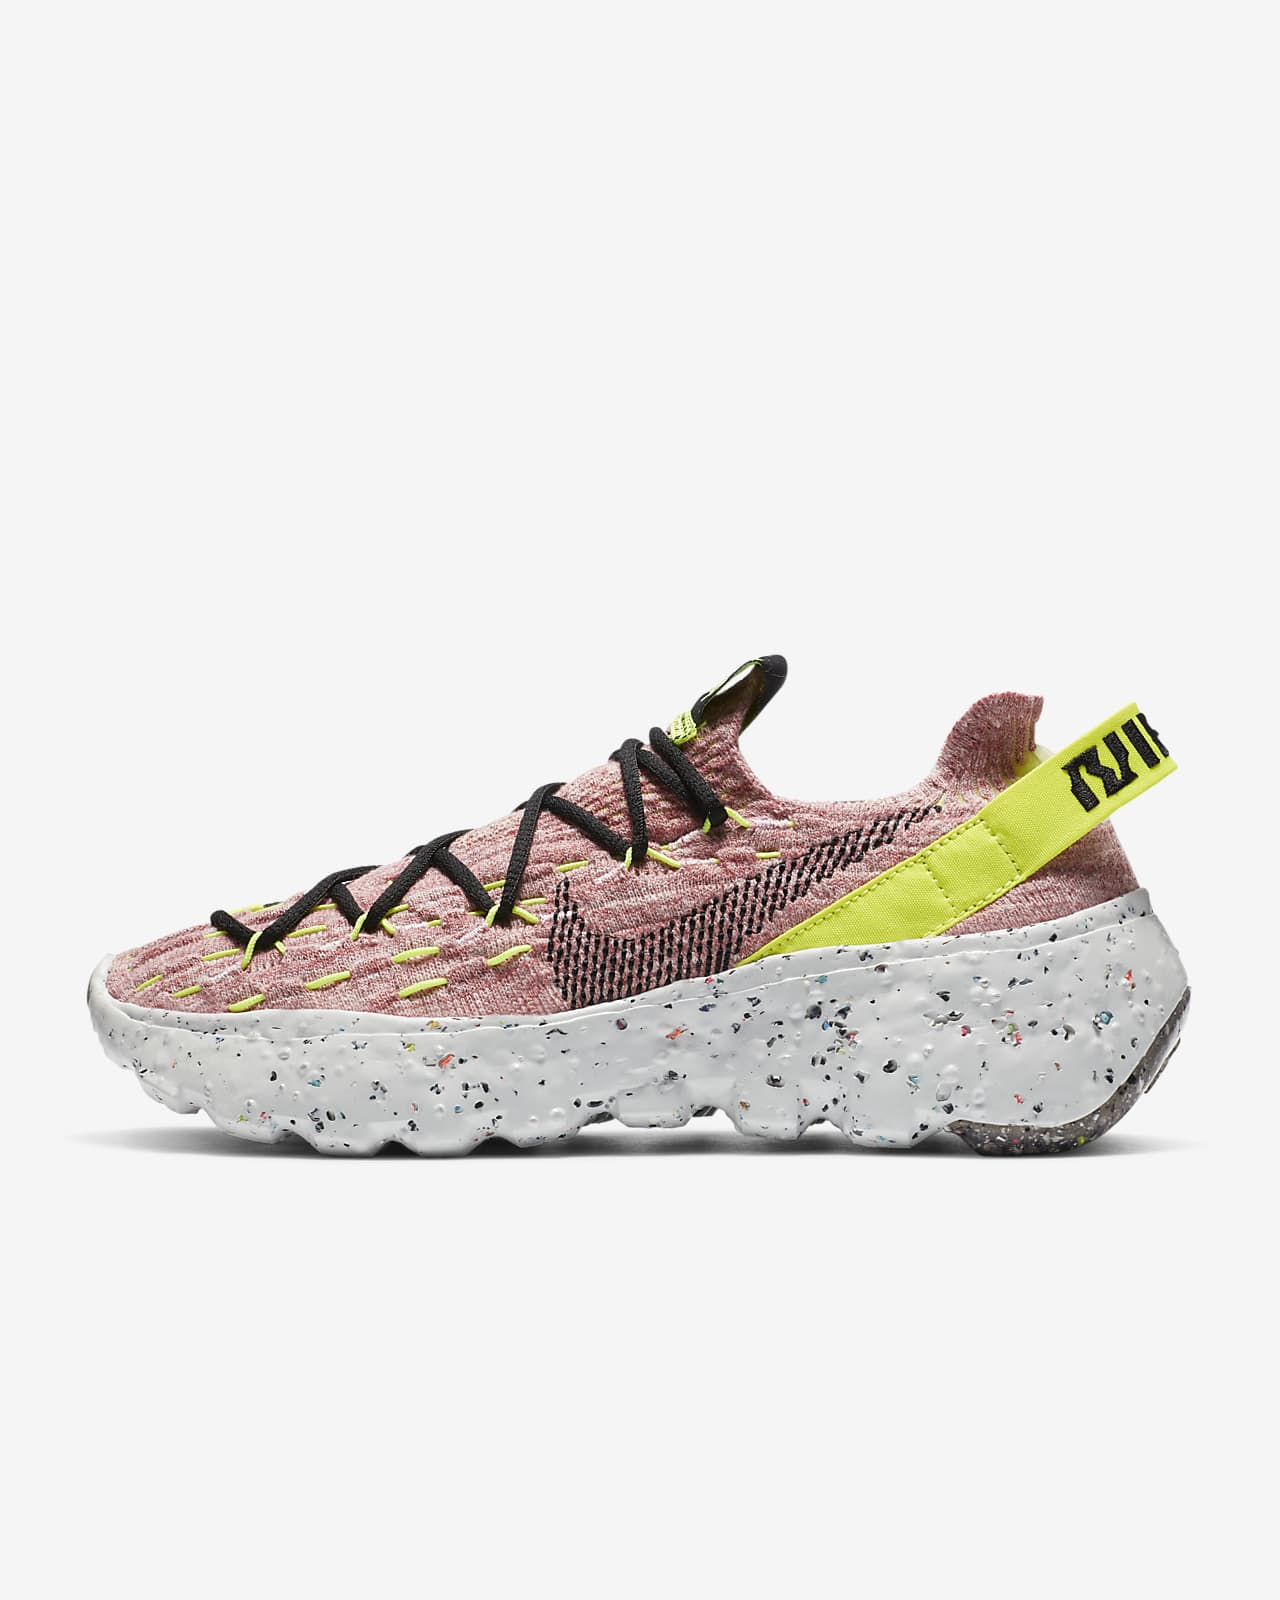 Sko Nike Space Hippie 04 för kvinnor